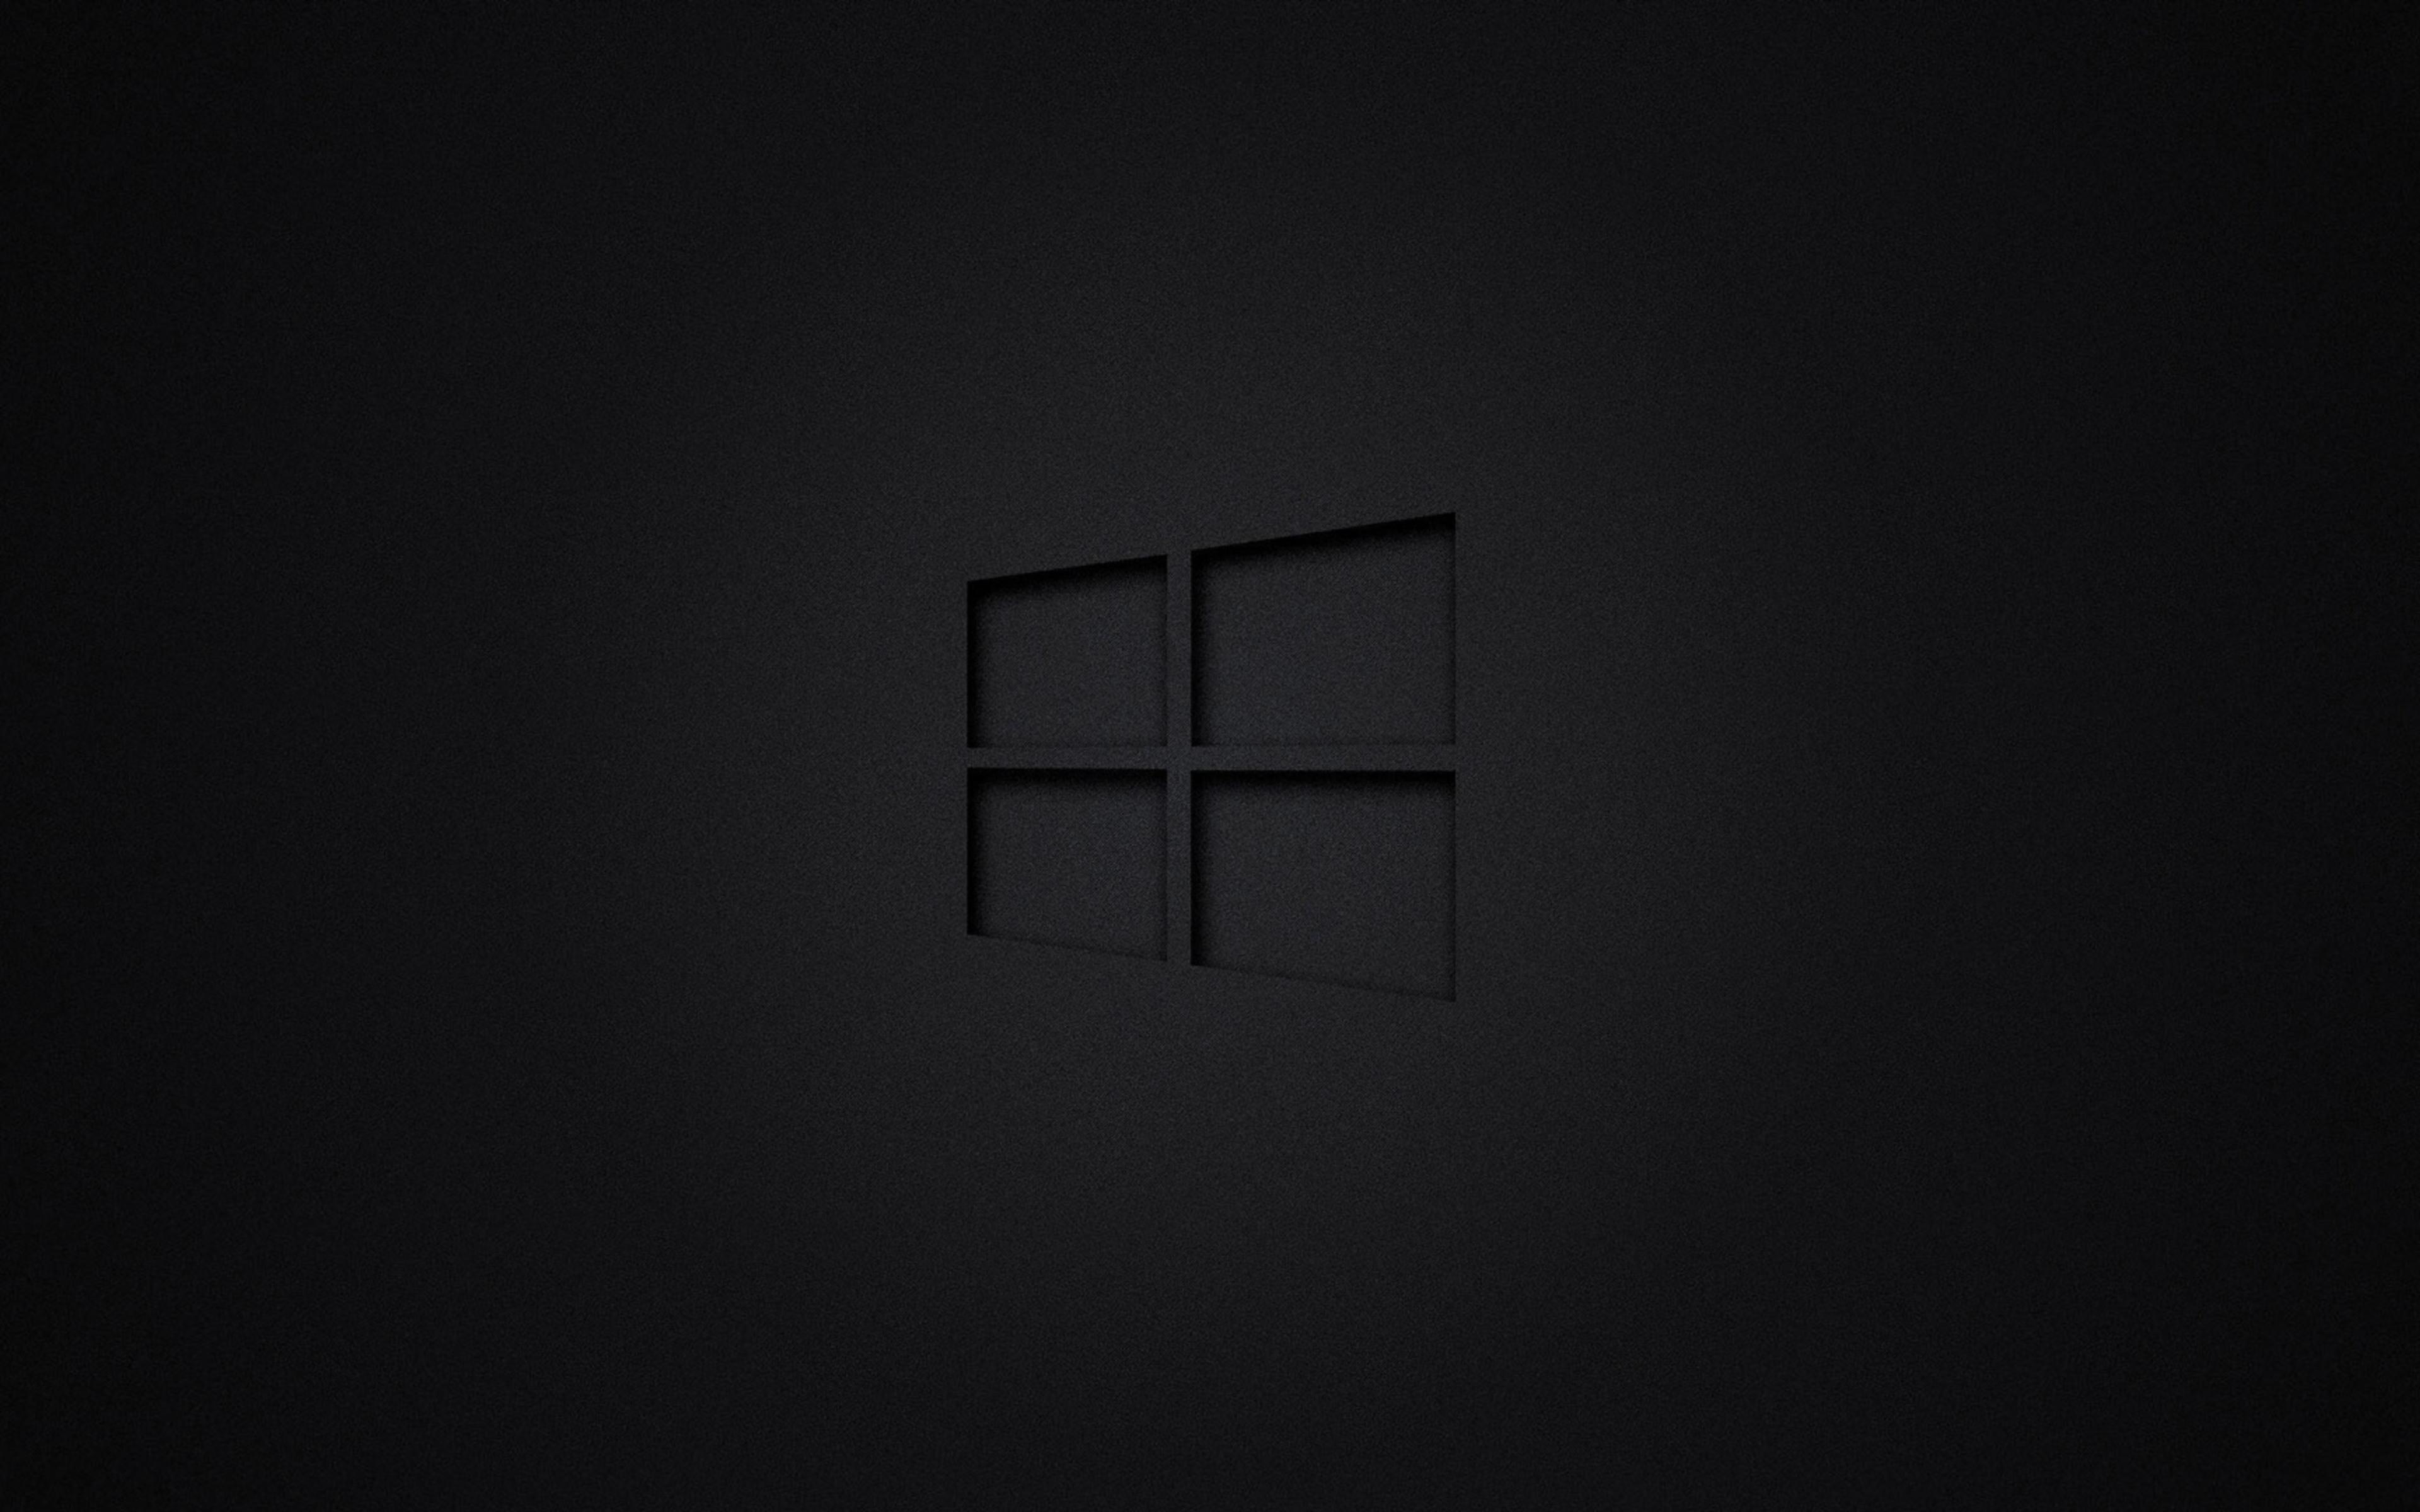 Windows 10 Wallpaper Dark